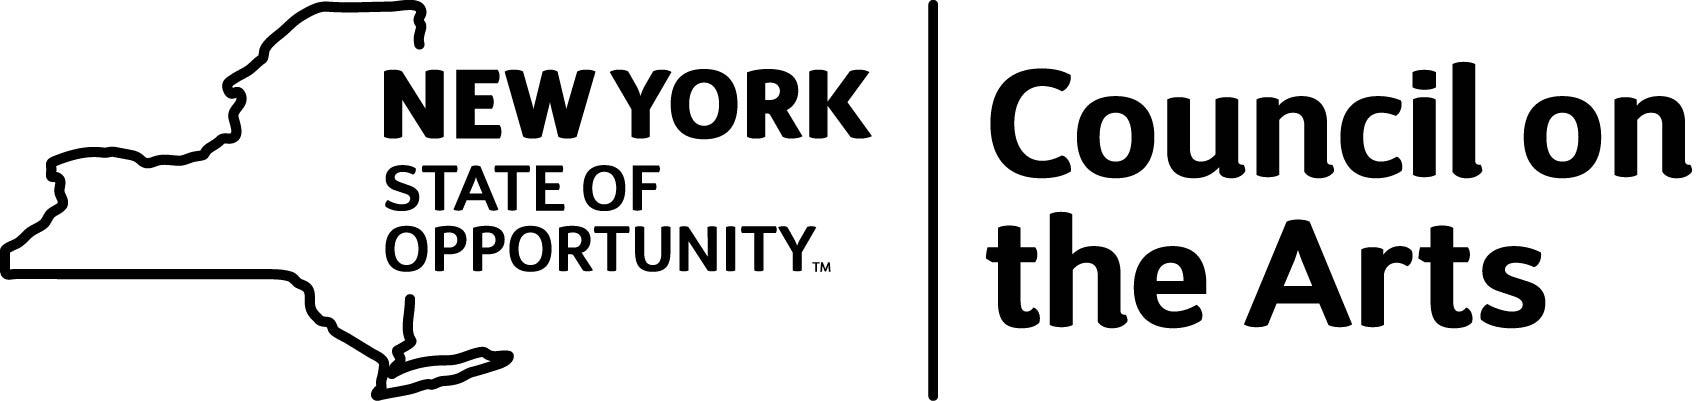 NYSCA Logo_2015.JPG